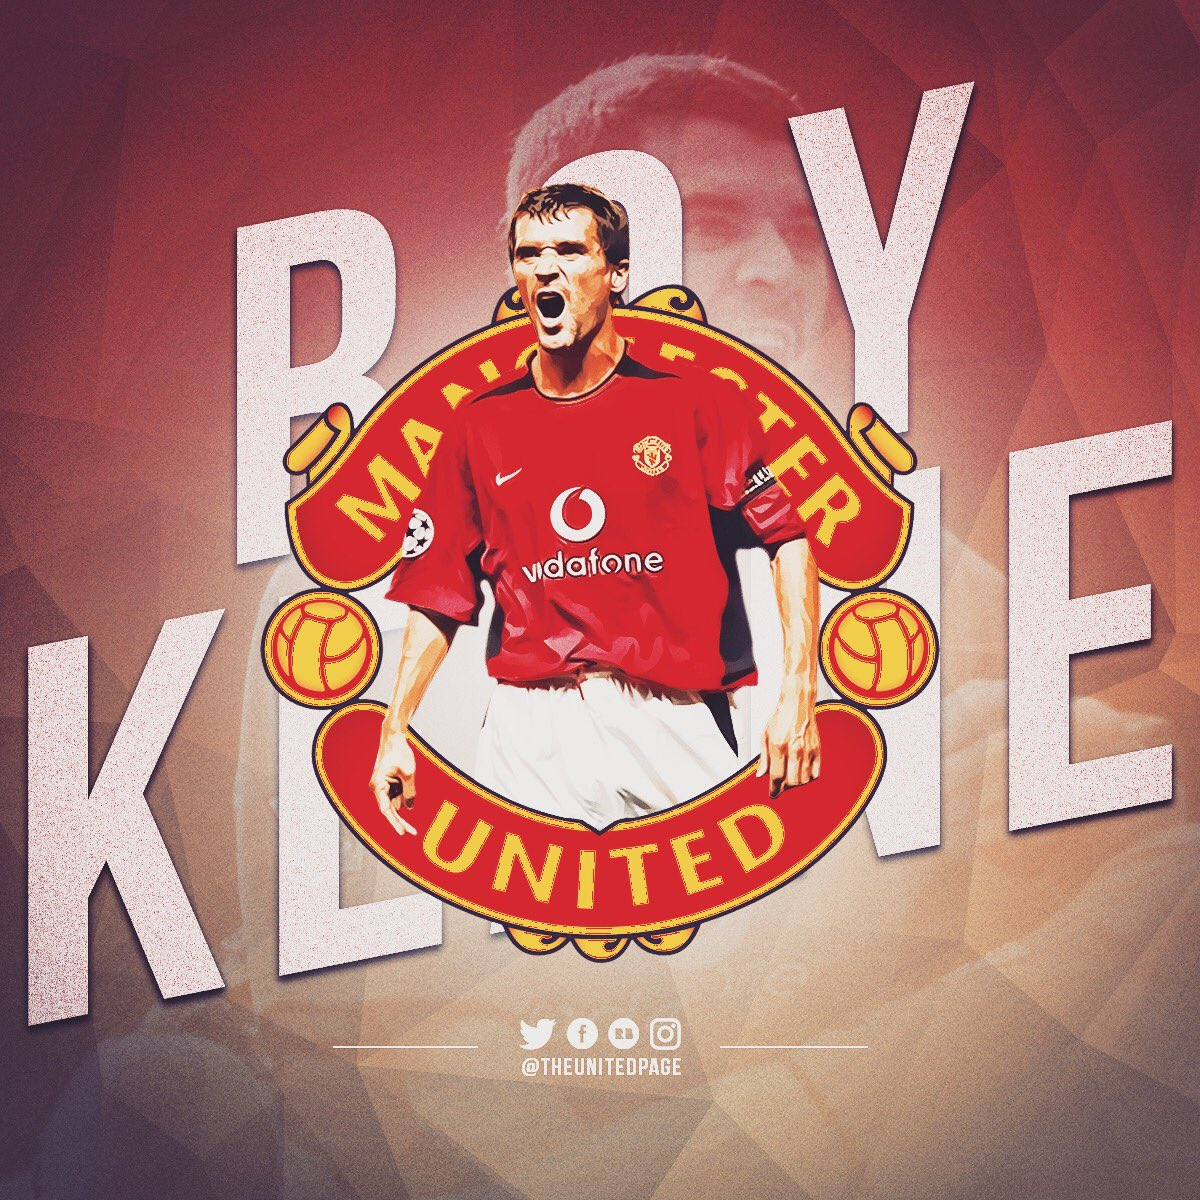 Captain. Leader. Legend. Happy birthday Roy Keane!